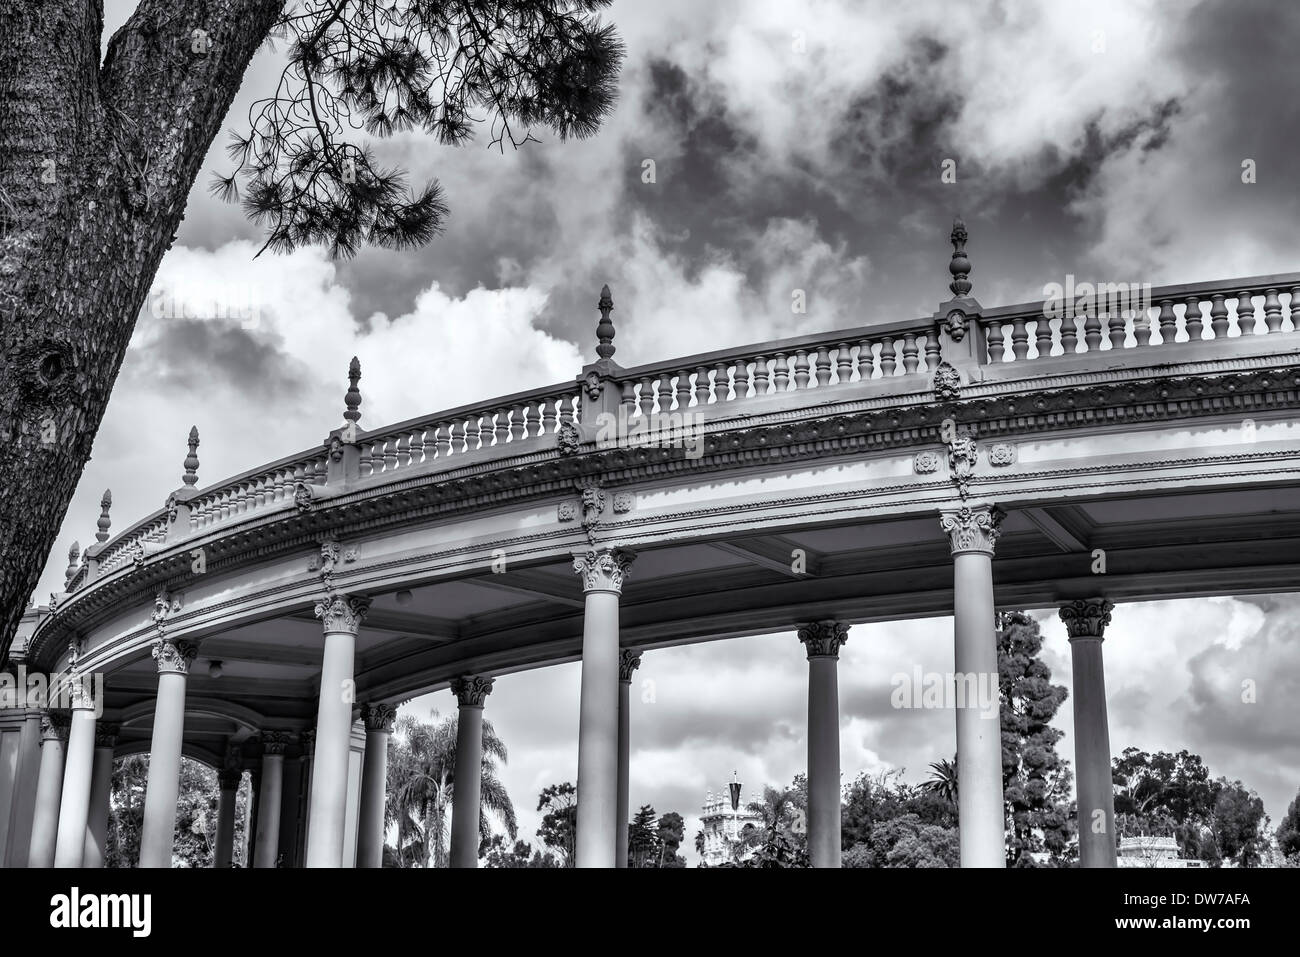 Spreckels Organ Pavilion. Balboa Park, San Diego, California, United States. - Stock Image